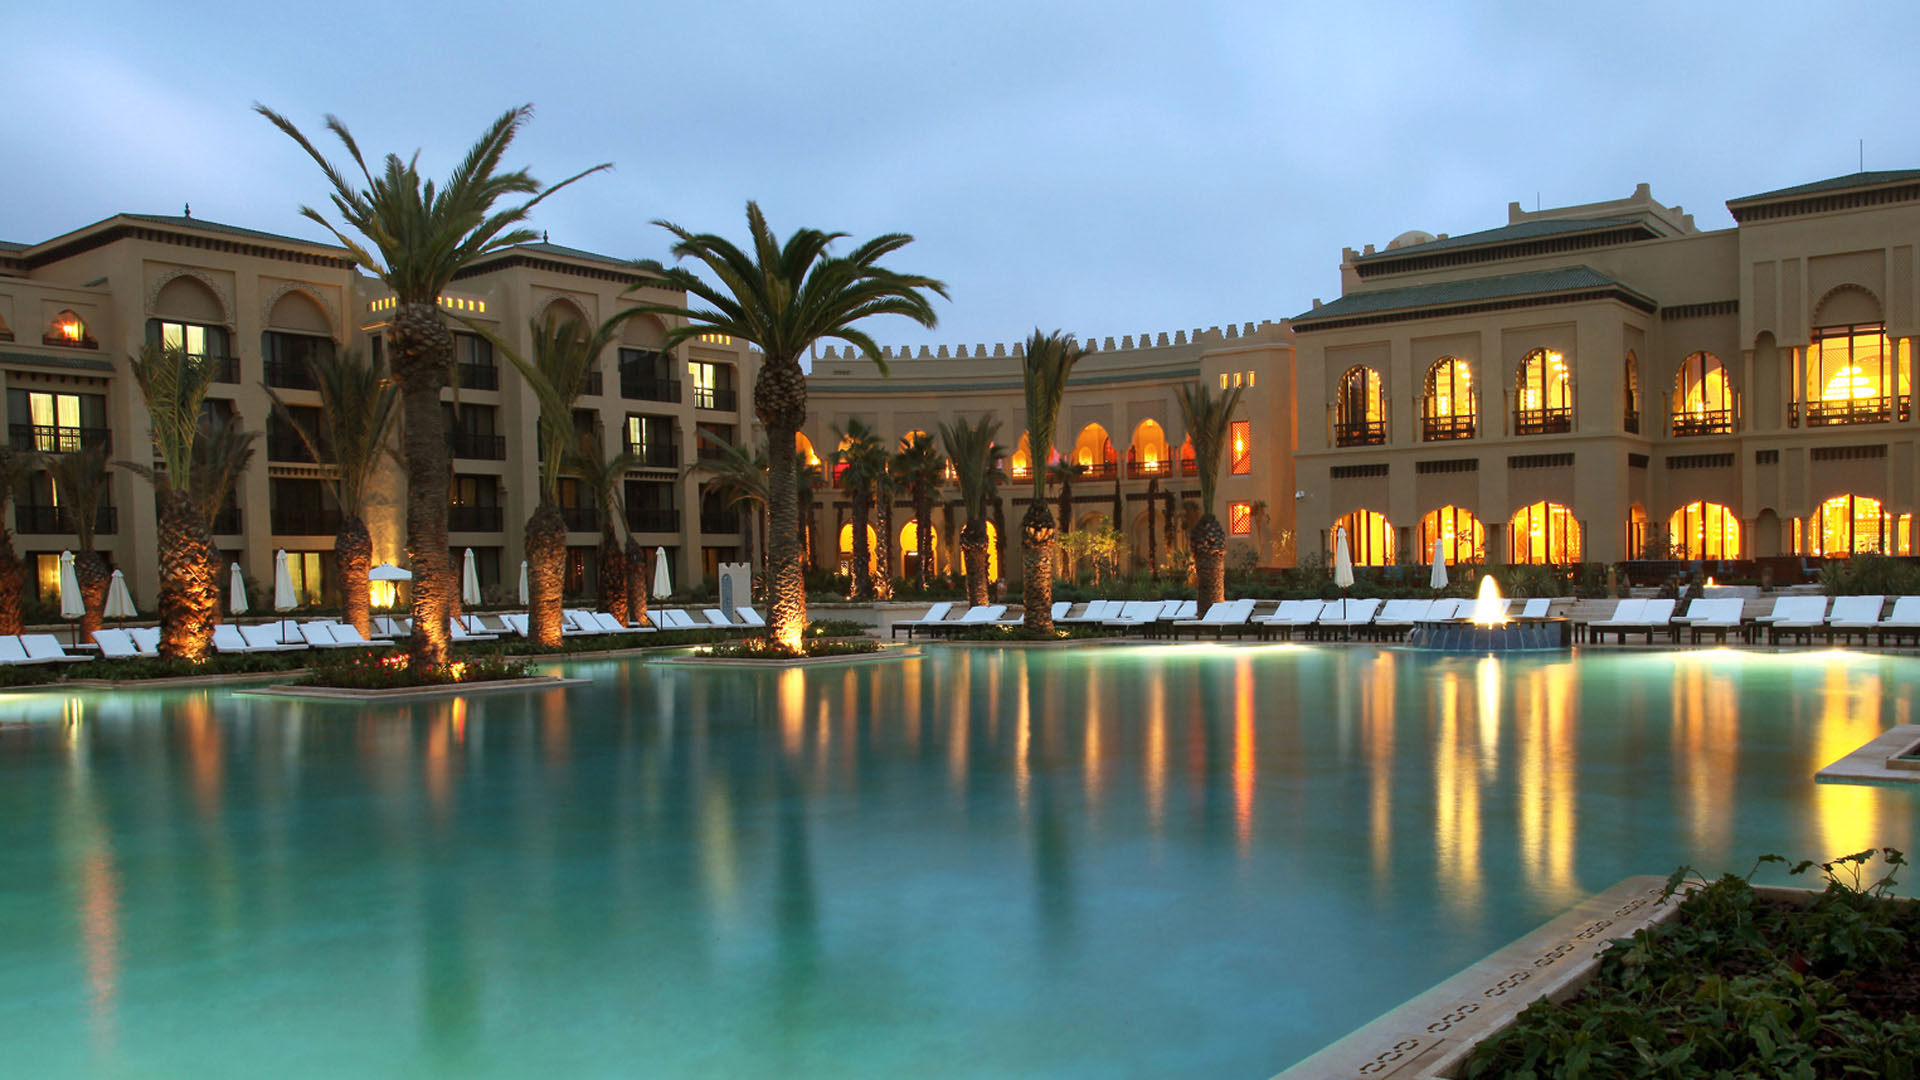 hotel au maroc vacances arts guides voyages. Black Bedroom Furniture Sets. Home Design Ideas